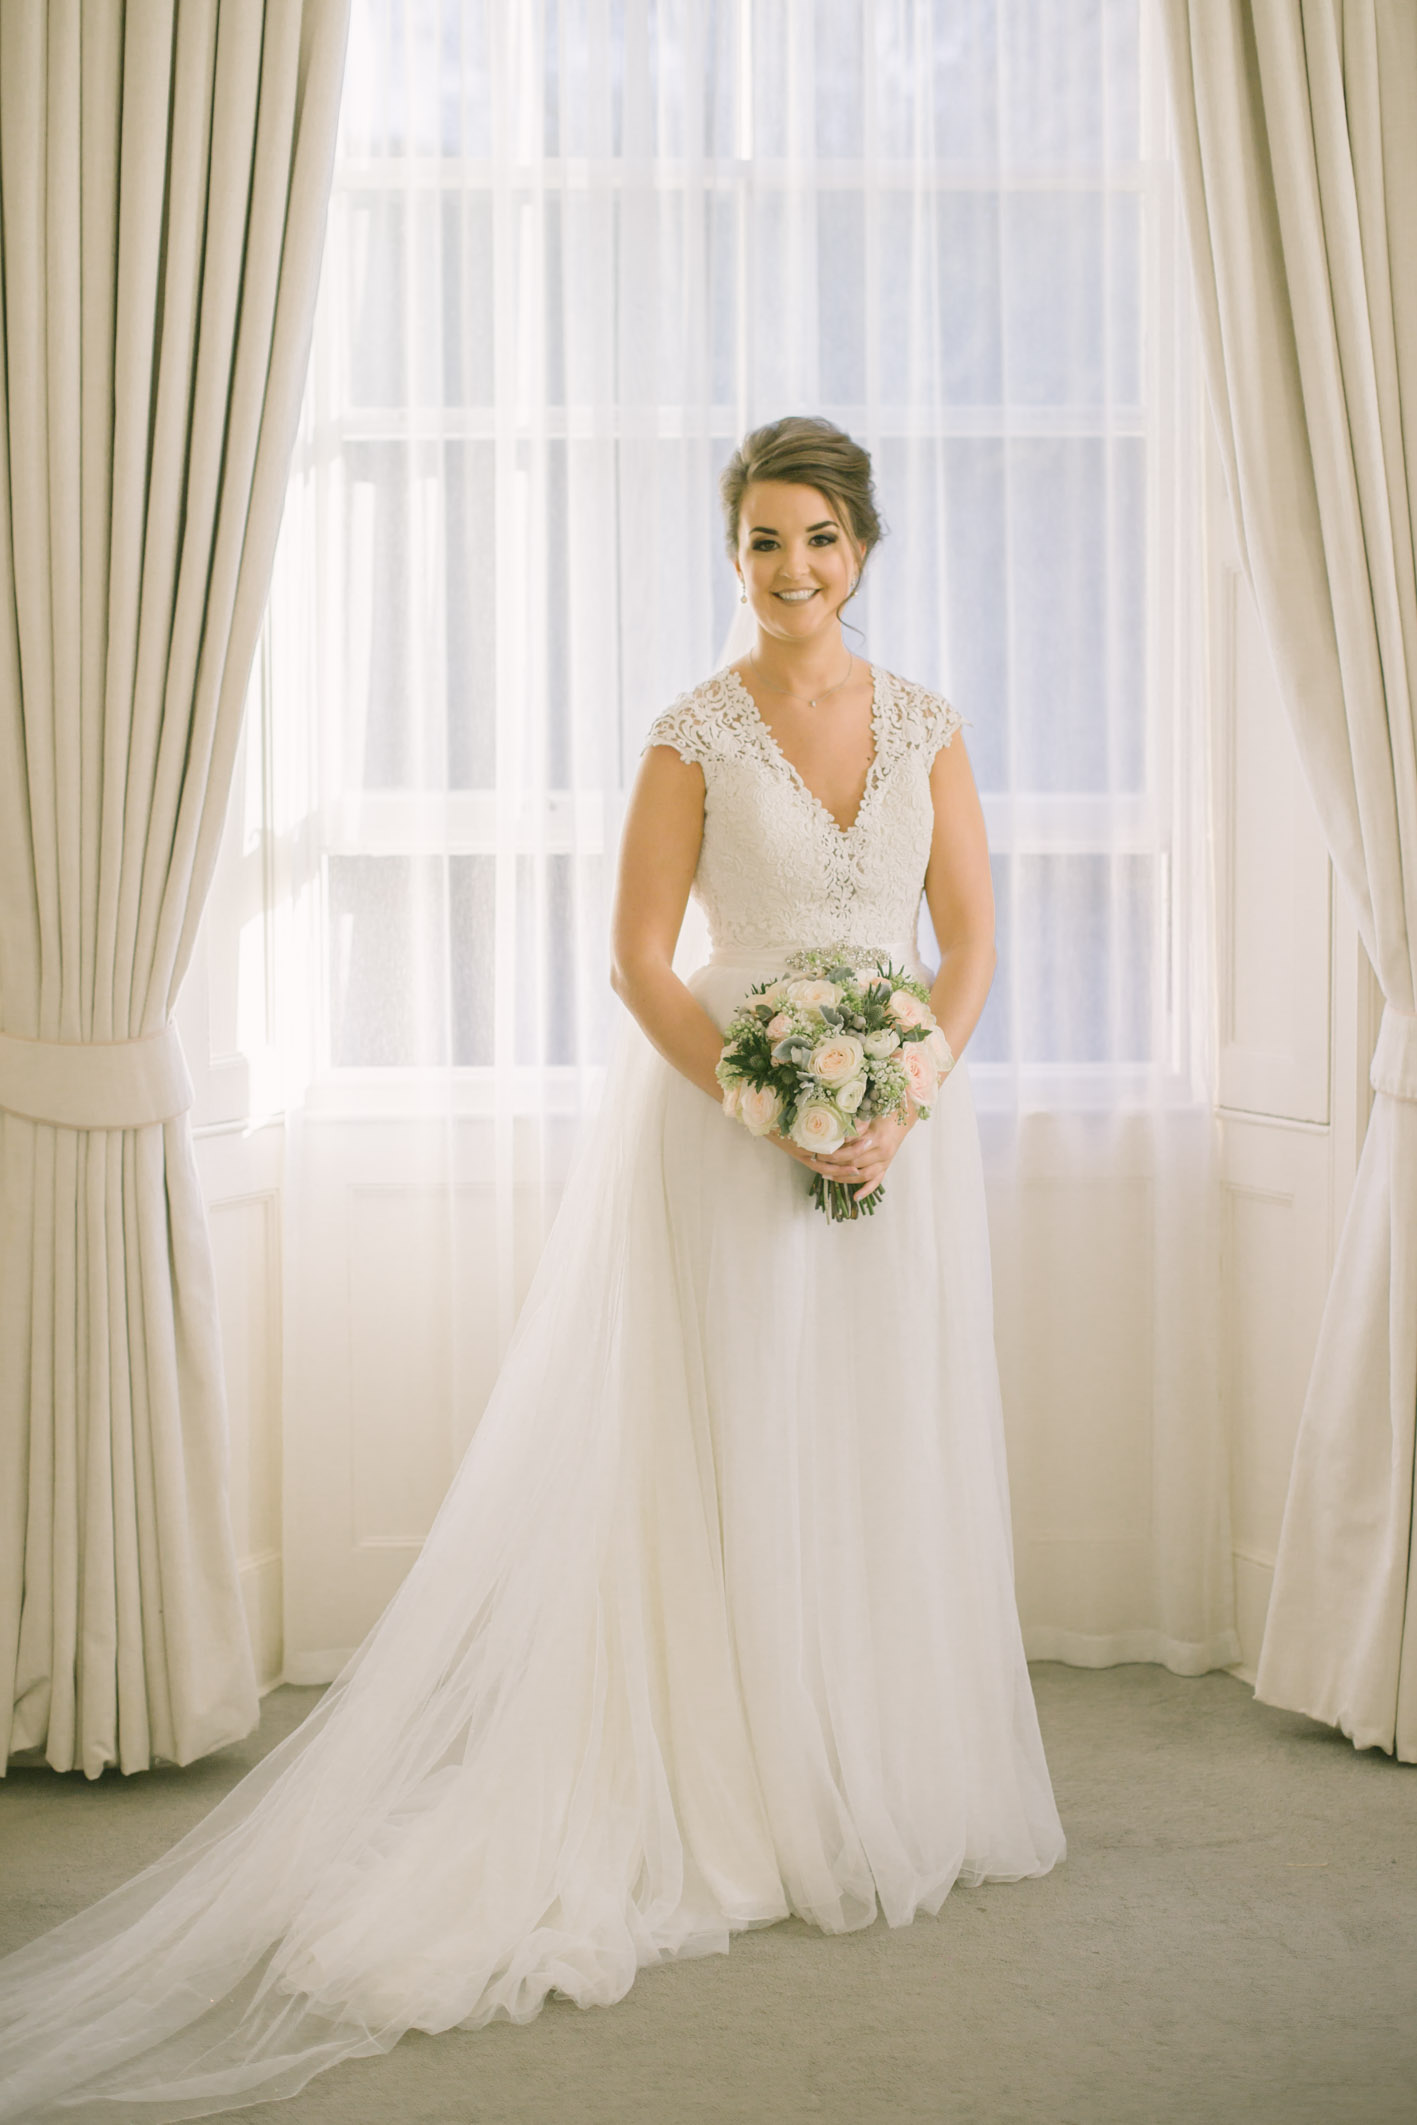 Bridal Portraits at Balbirnie House Wedding | Photography by Ceranna | Fife Wedding Photographer